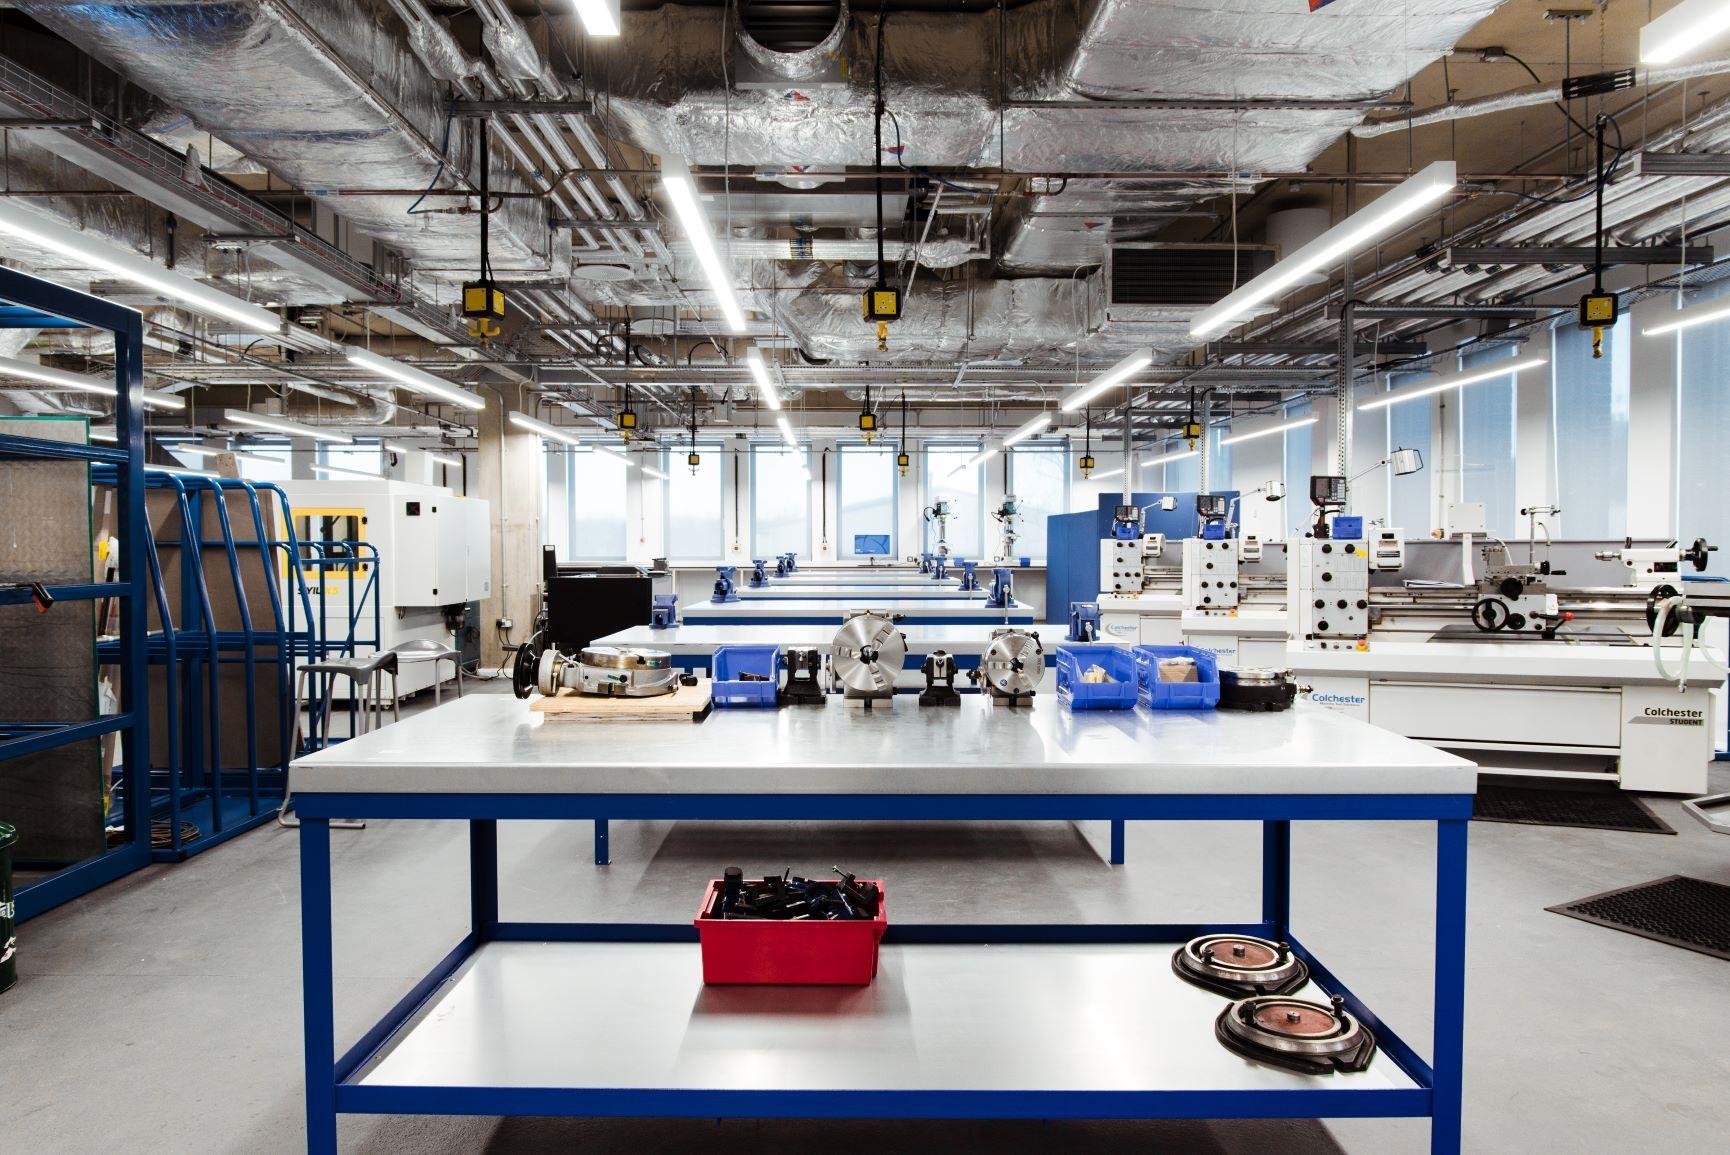 A Glimpse Inside the Verena Holmes Building Engineering Workshop